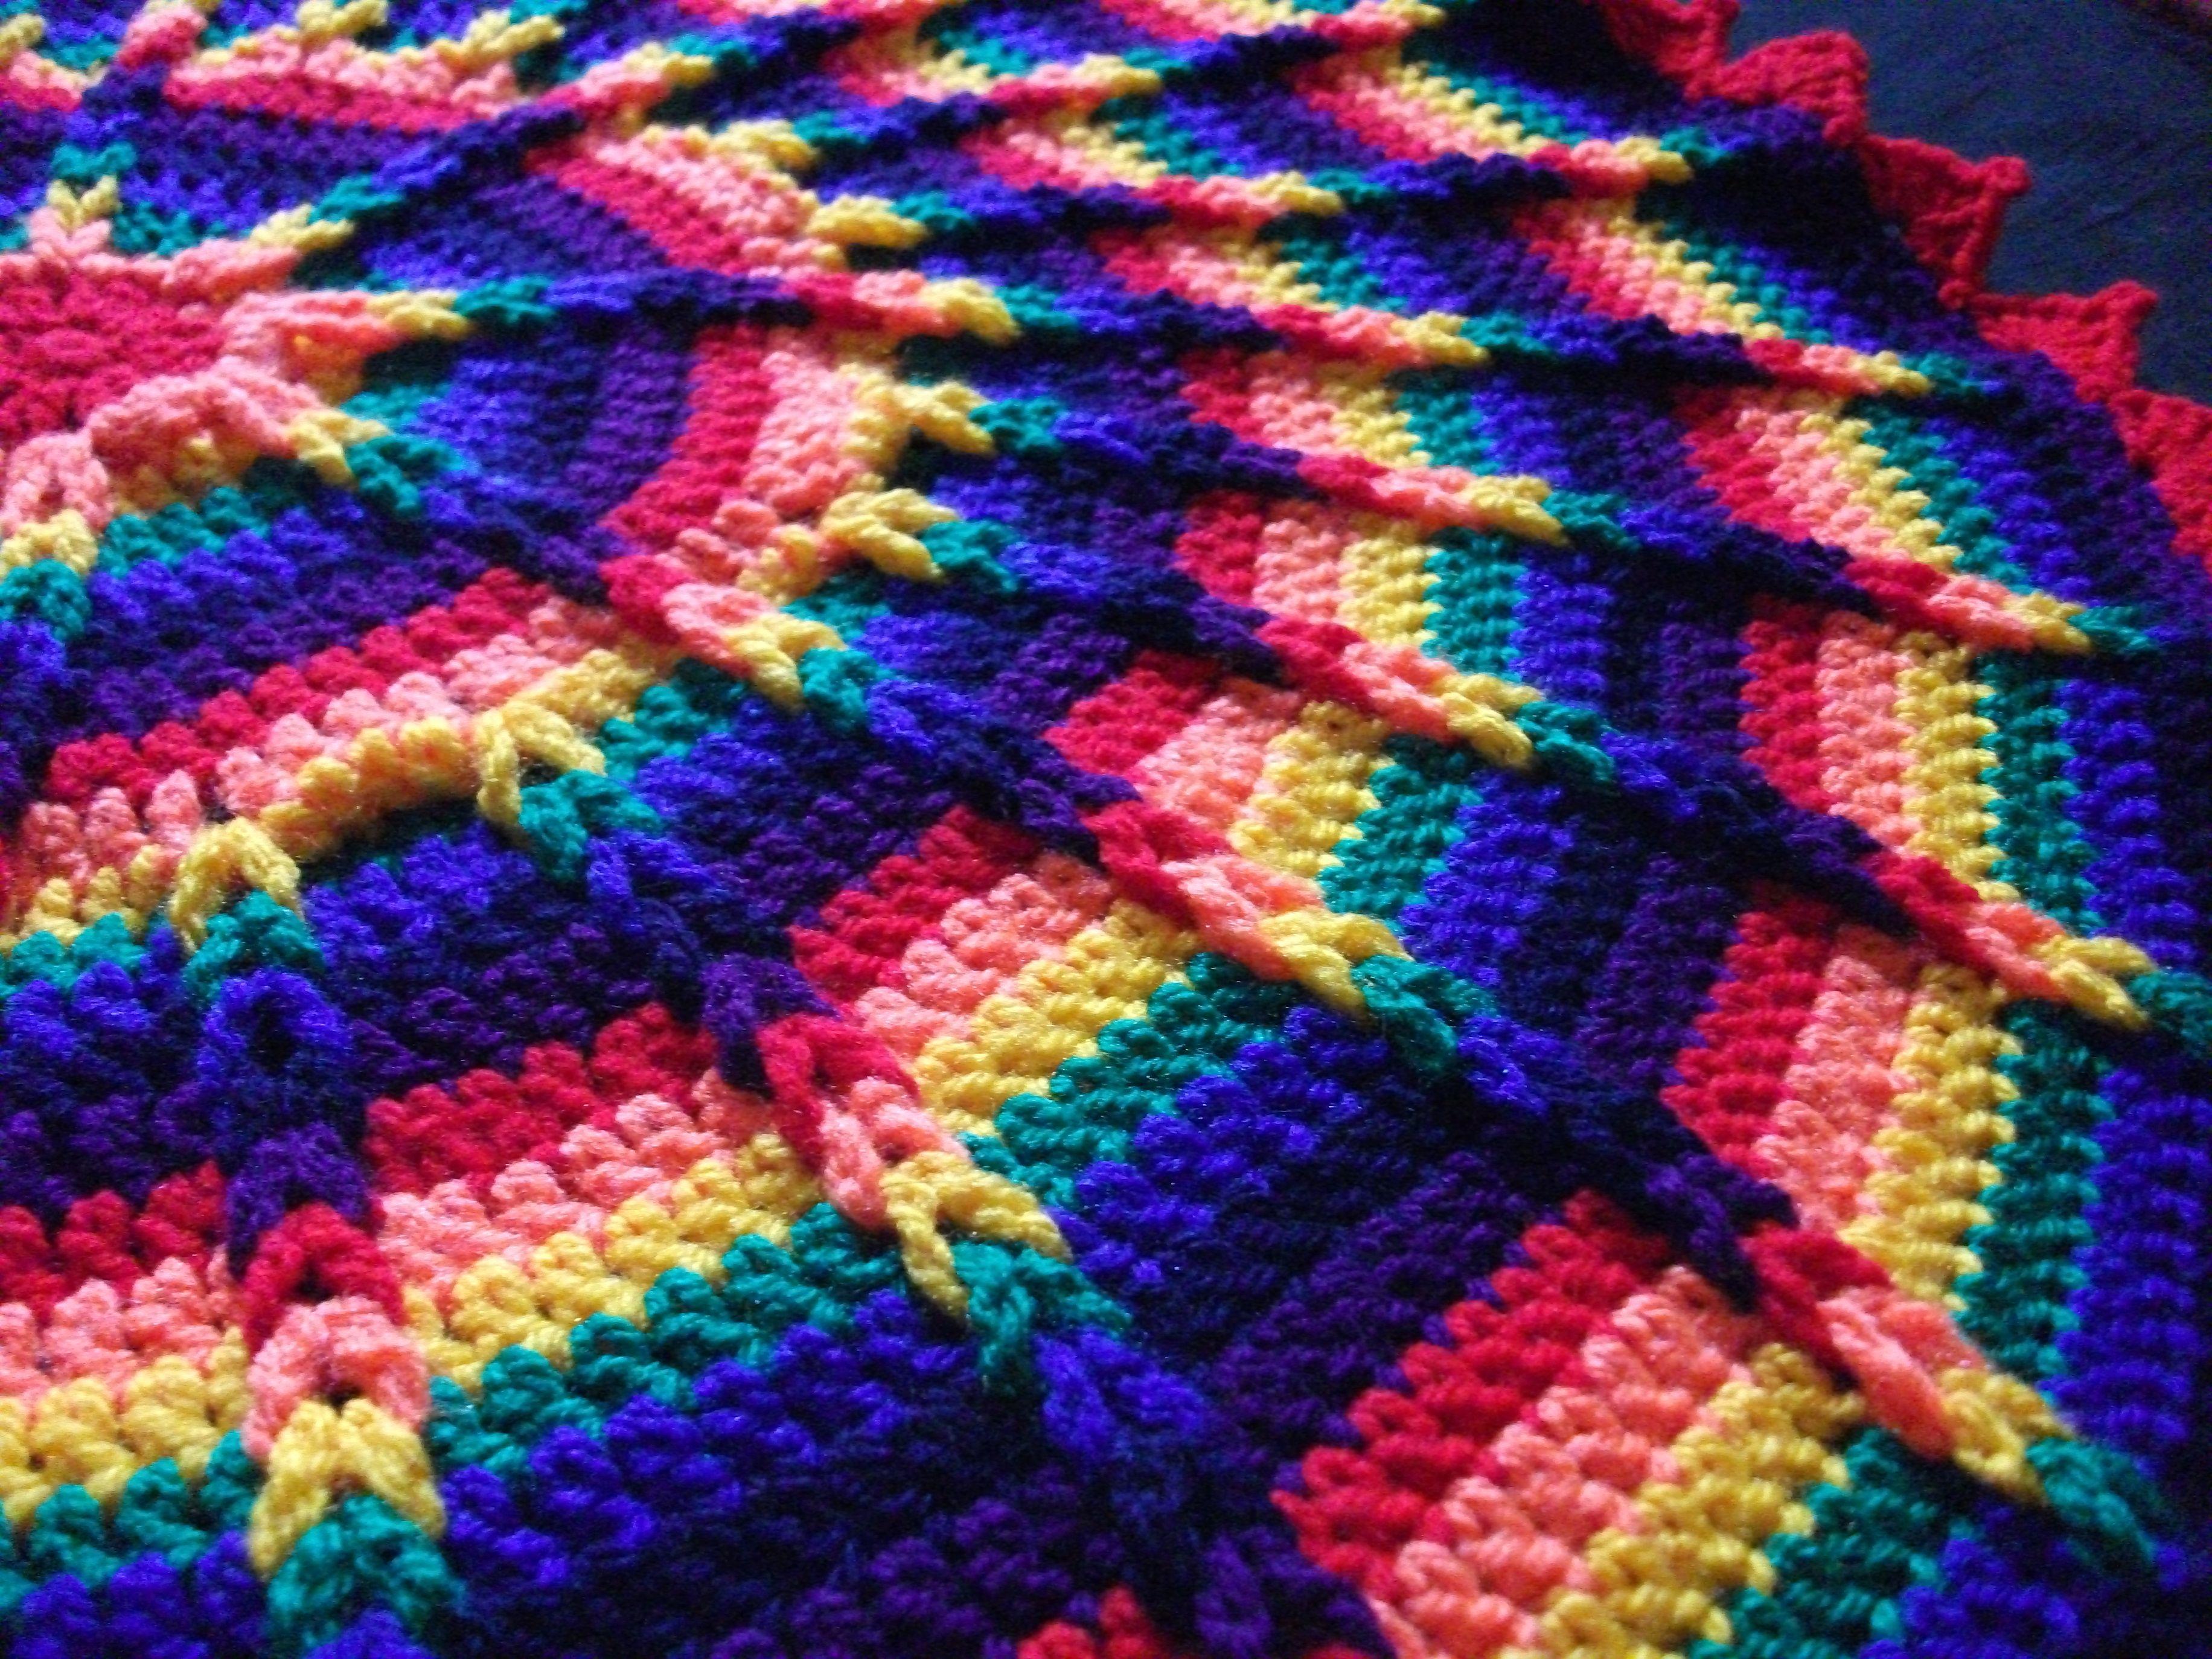 Crochet rainbow round jacobs ladder blanket crochet goodness crochet rainbow round jacobs ladder blanket bankloansurffo Images